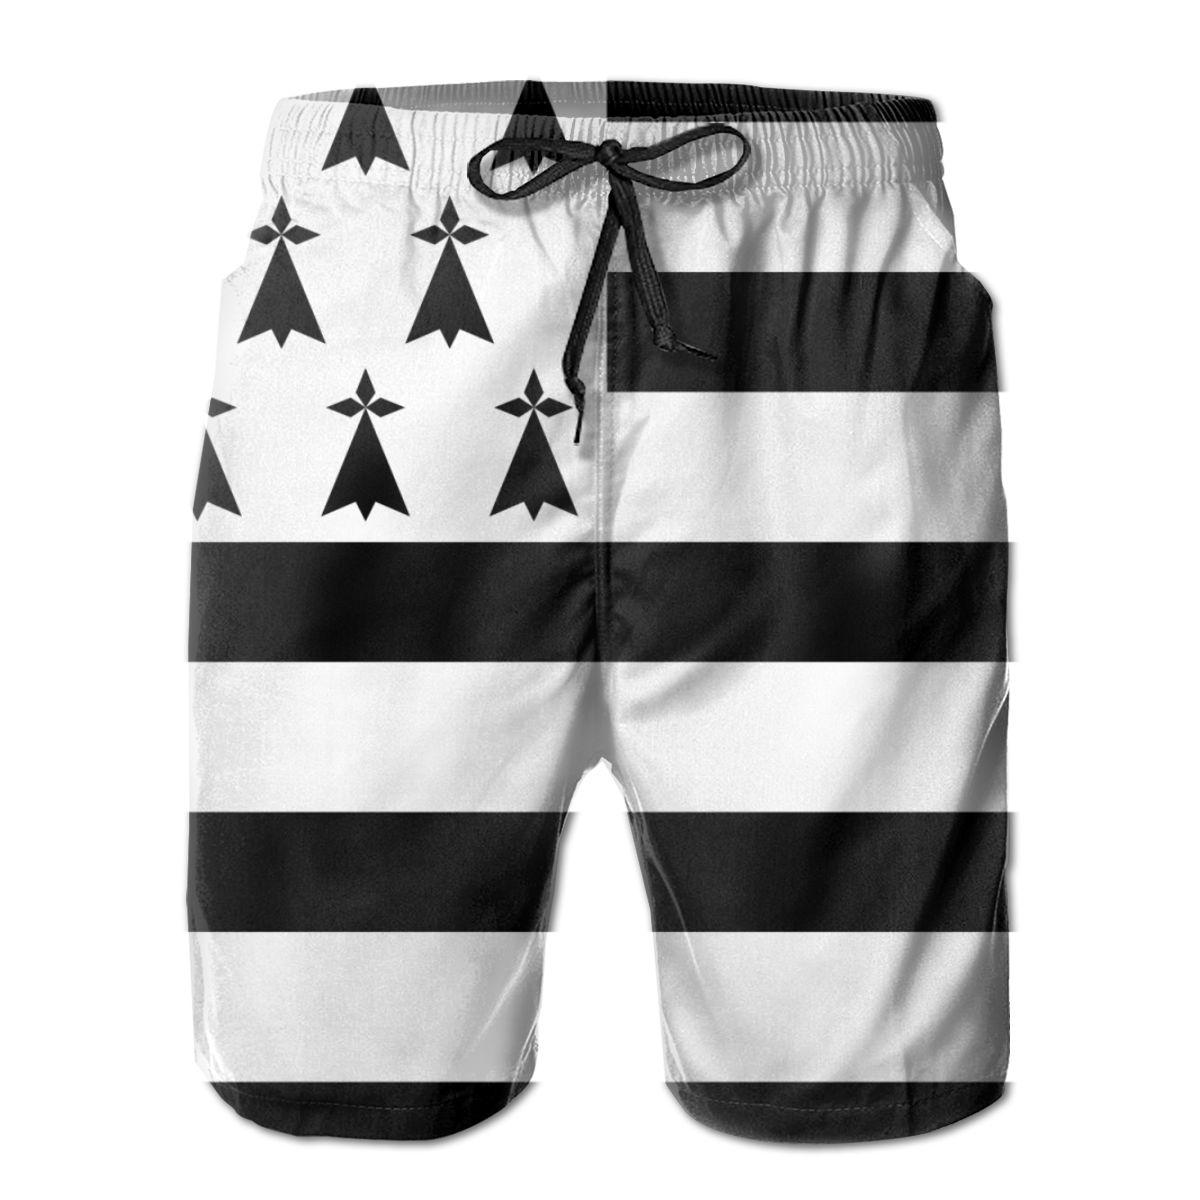 New Summer Beach Men's Shorts Printing Casual Quick Dry Board Shorts Hanging Breizh Bretagne Llydaw Brittany Mens Short Pant